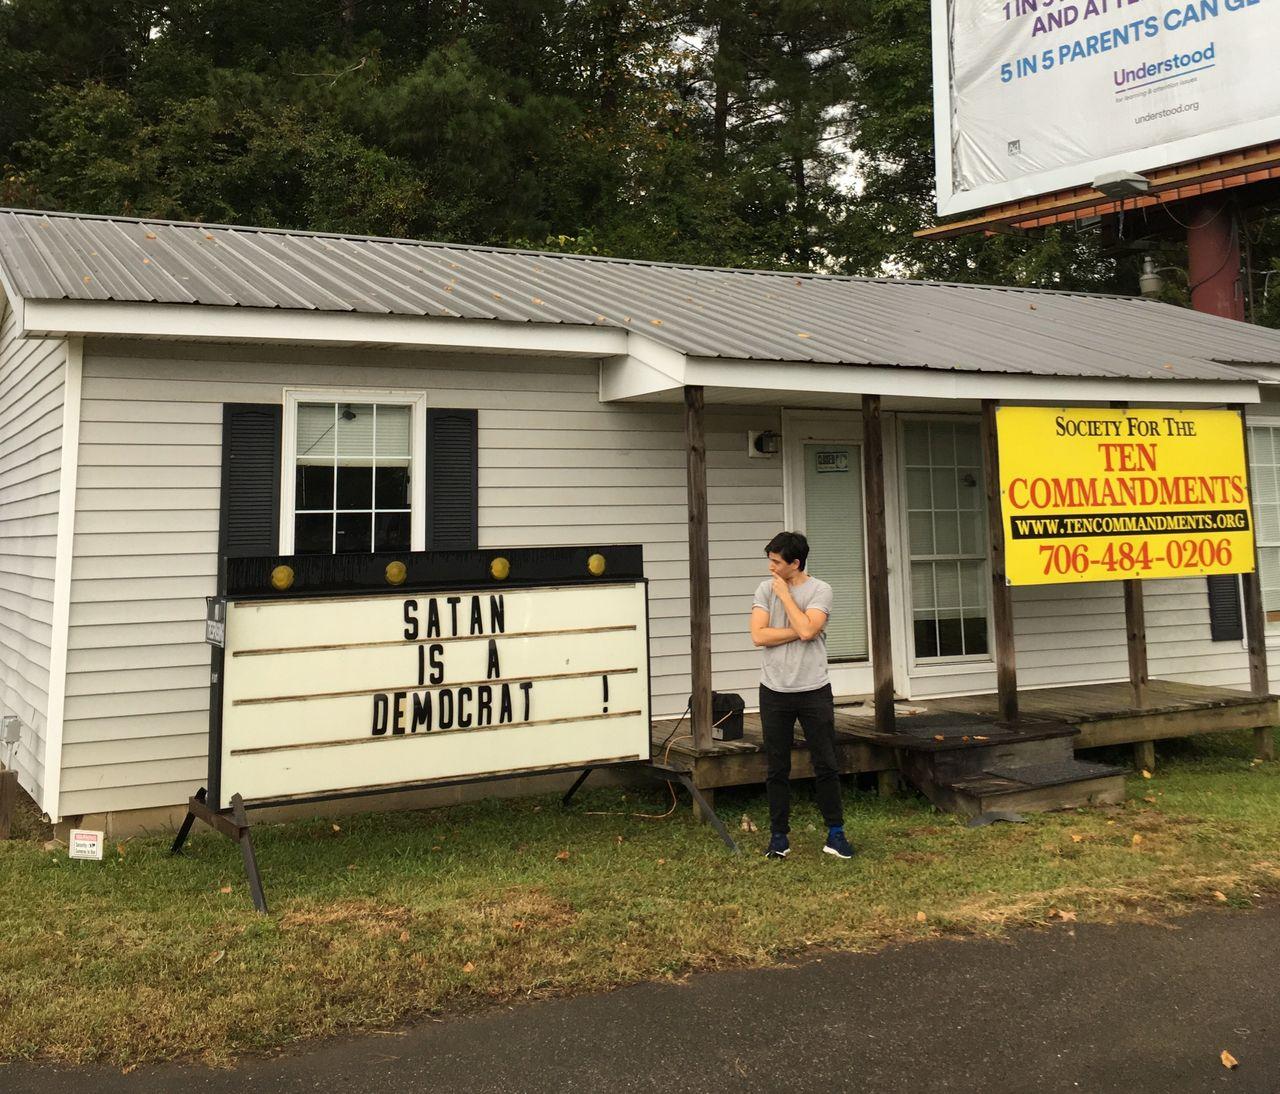 Plaut scrutinizing a local church sign in Milledgeville, Georgia, in September 2018.